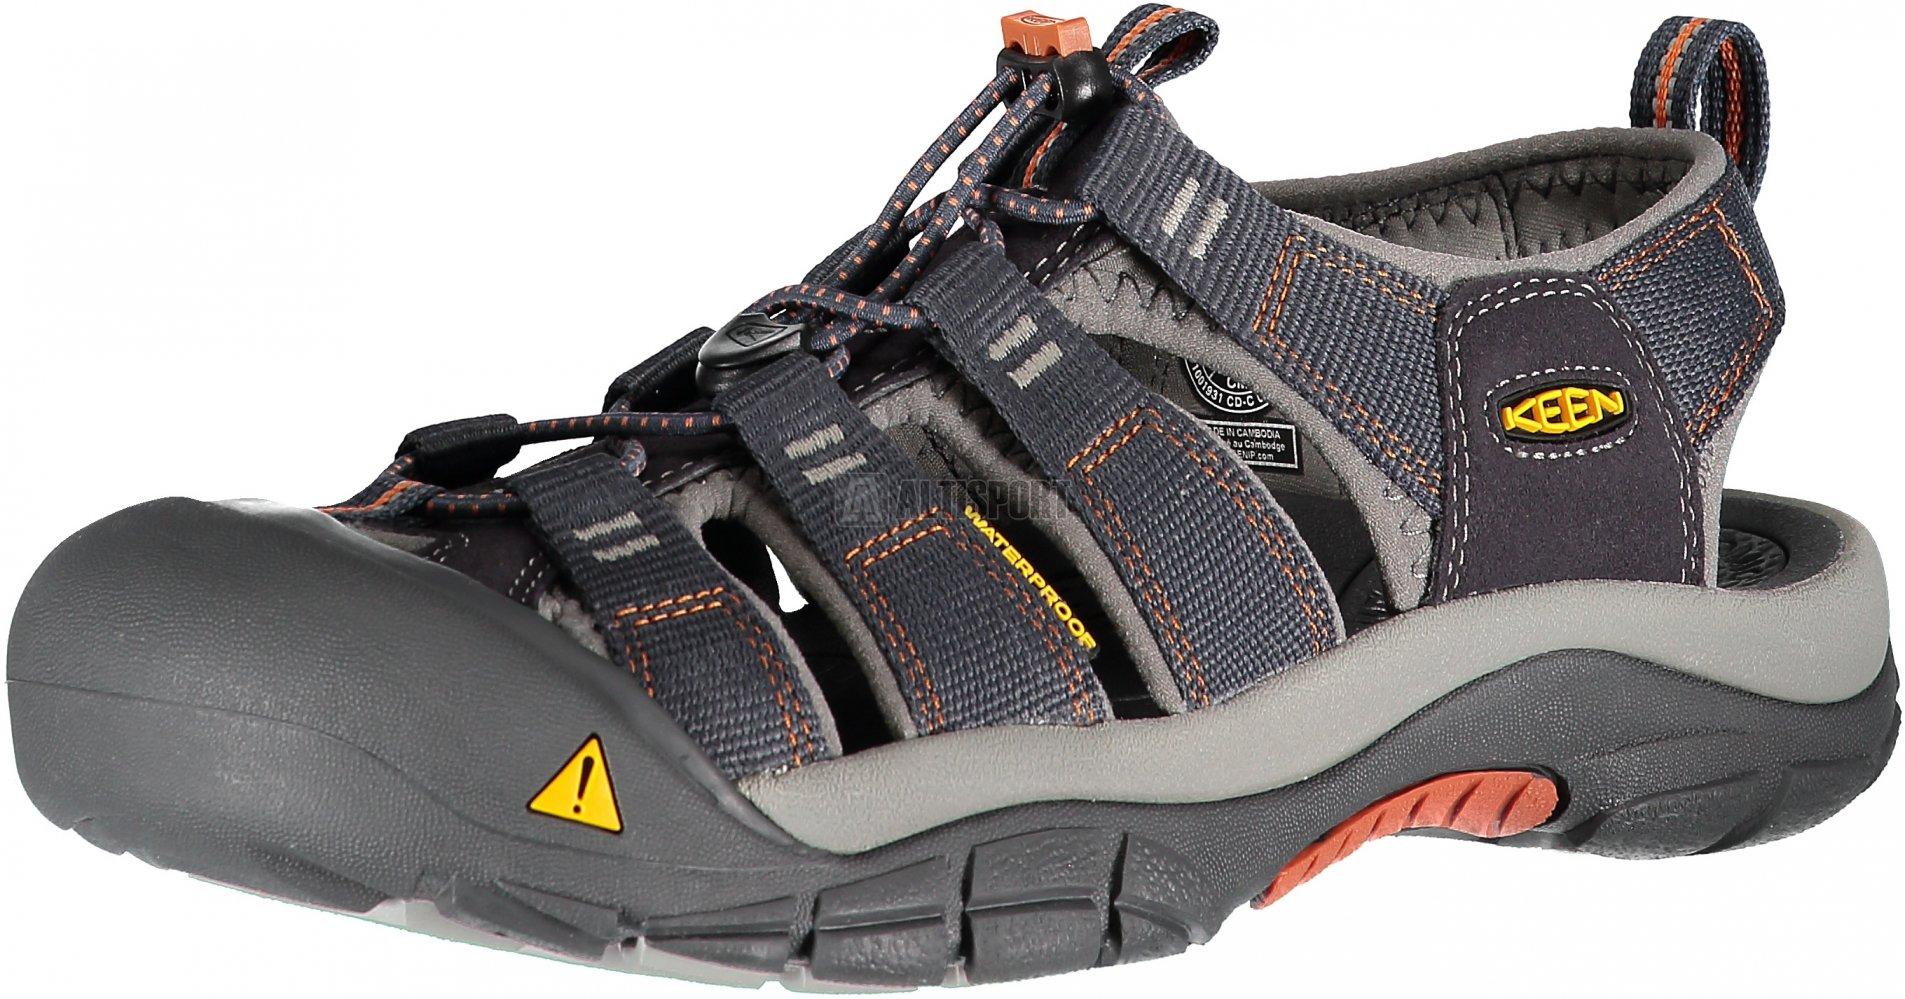 ed1025d43a6f Pánské sandále KEEN NEWPORT H2 M INDIA INK RUST velikost  42 ( 8 ...